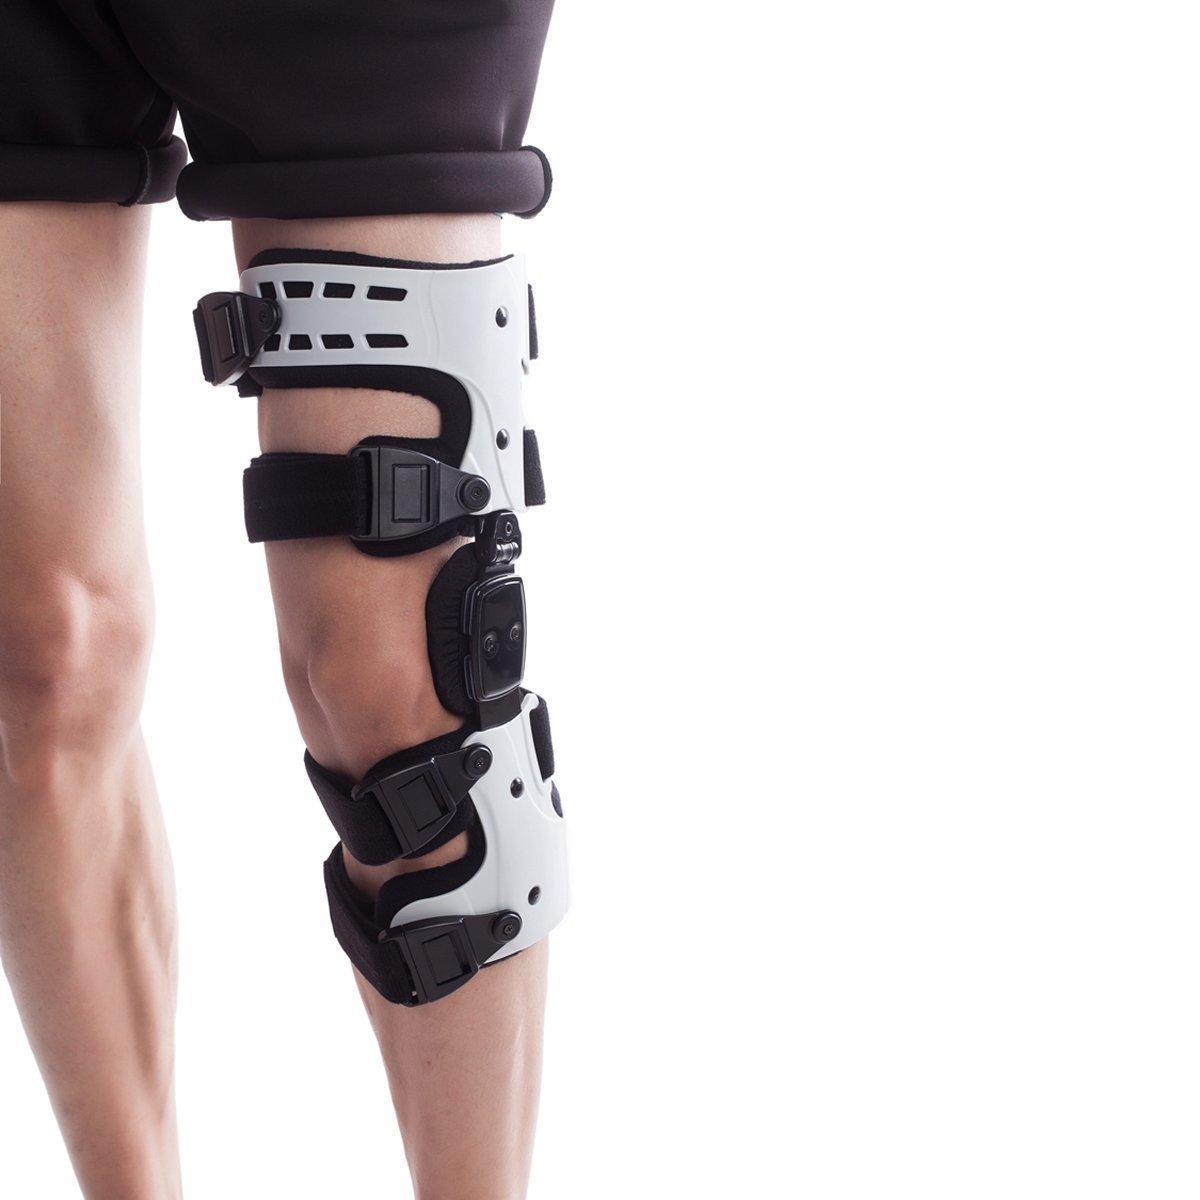 Orthomen OA (Osteoarthritis) Unloader Knee Support Brace - Lateral - Universal (Left)